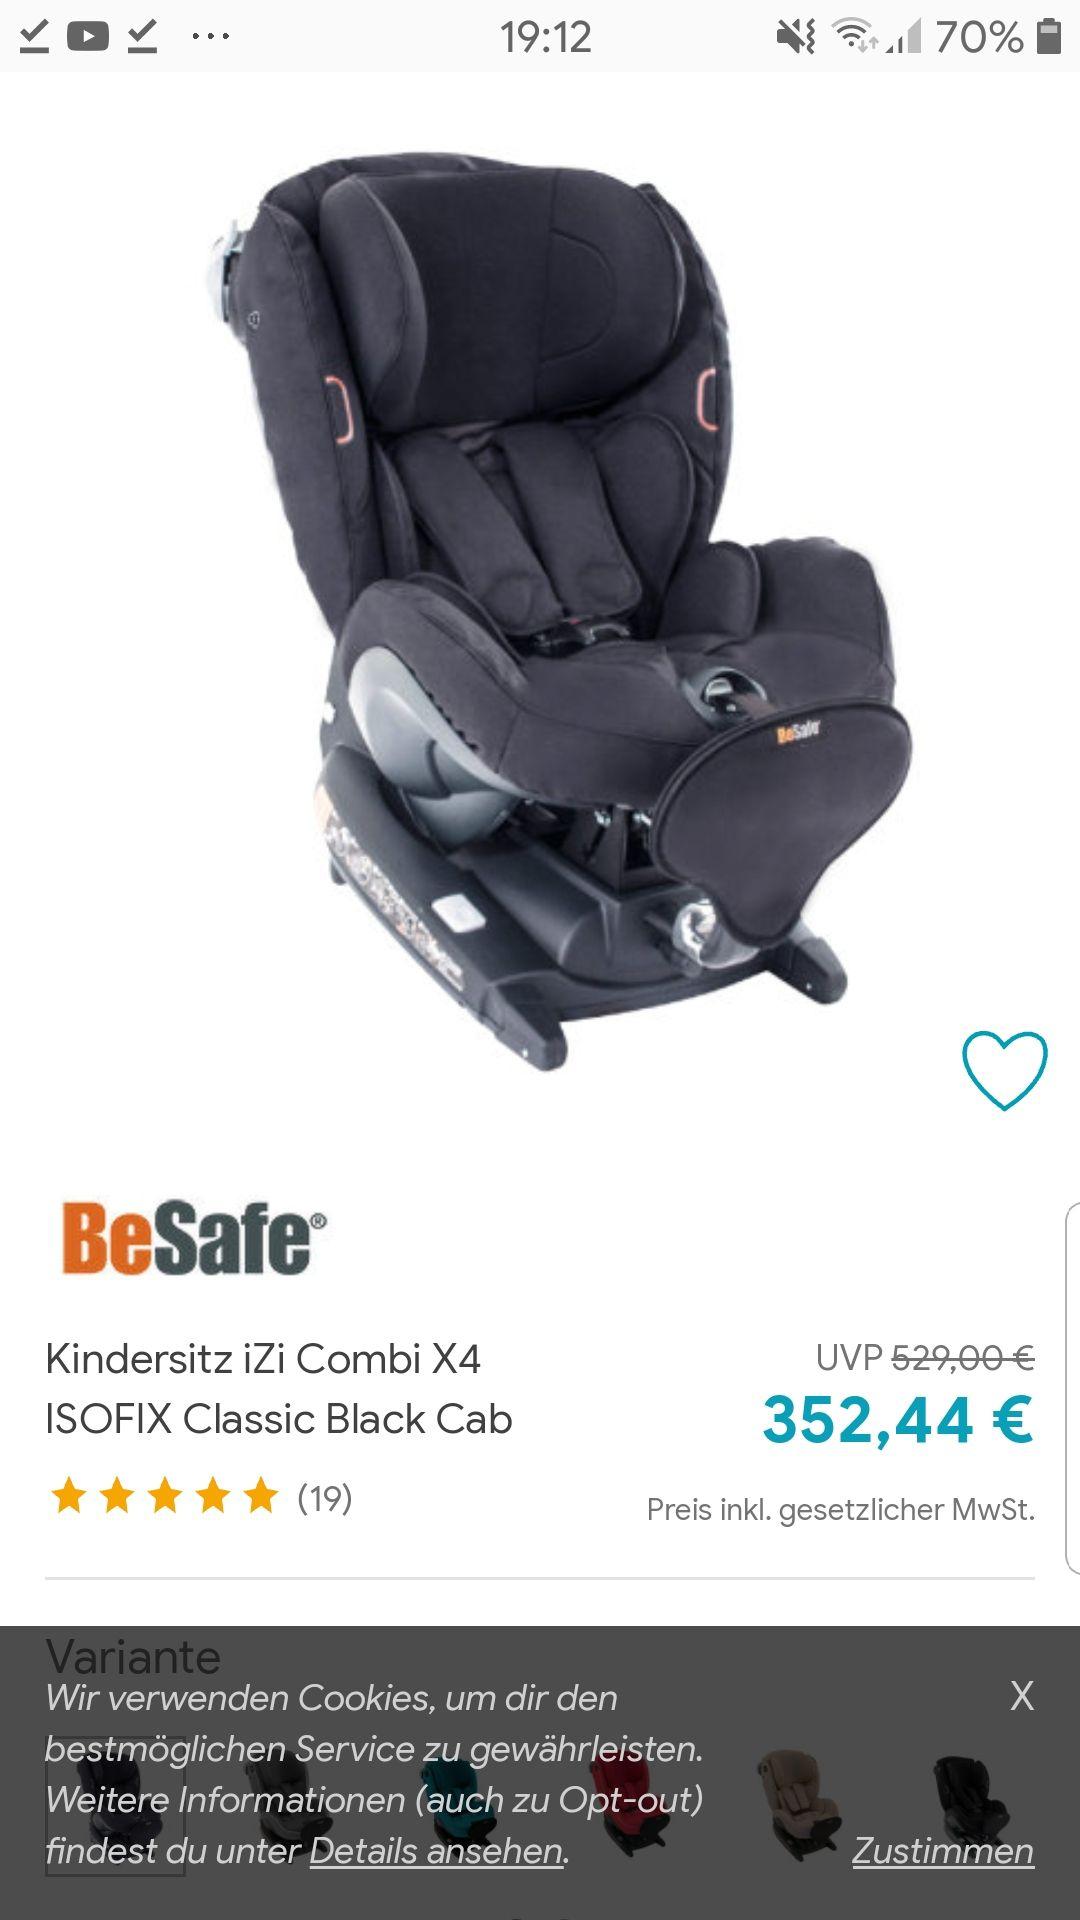 Kindersitz iZi Combi X4 ISOFIX Classic Black Cab